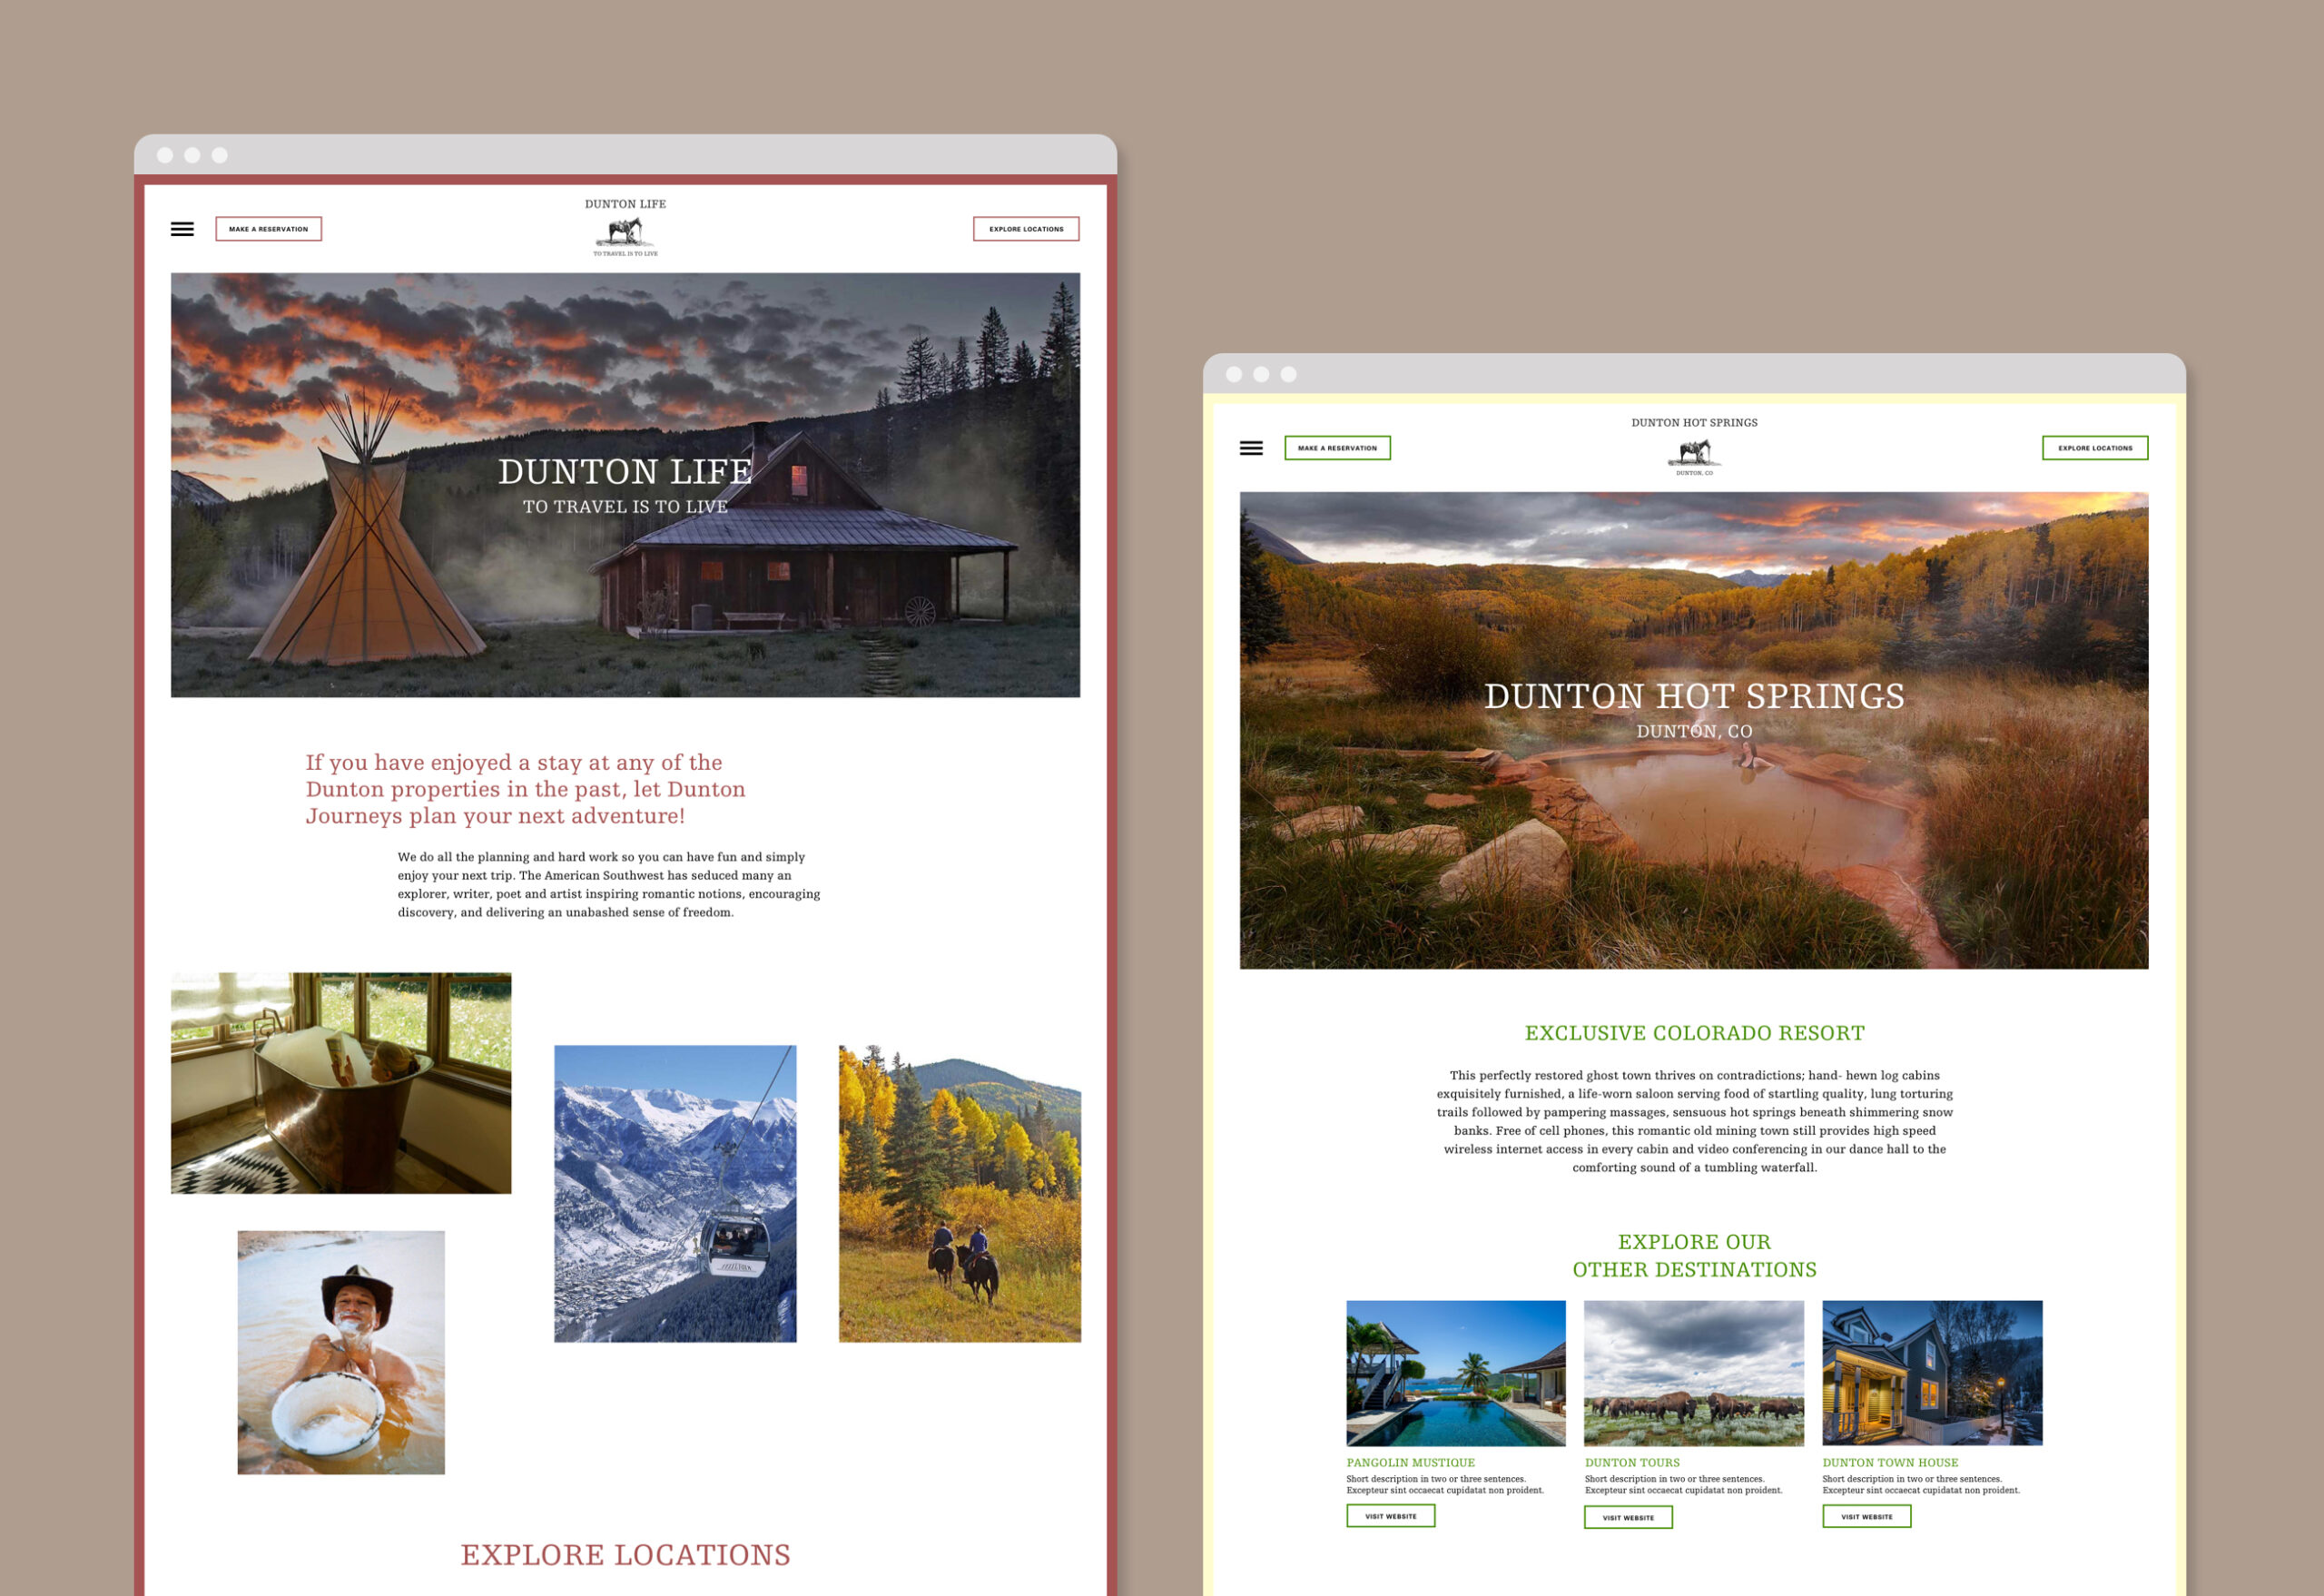 Dunton Hot Springs website screenshots